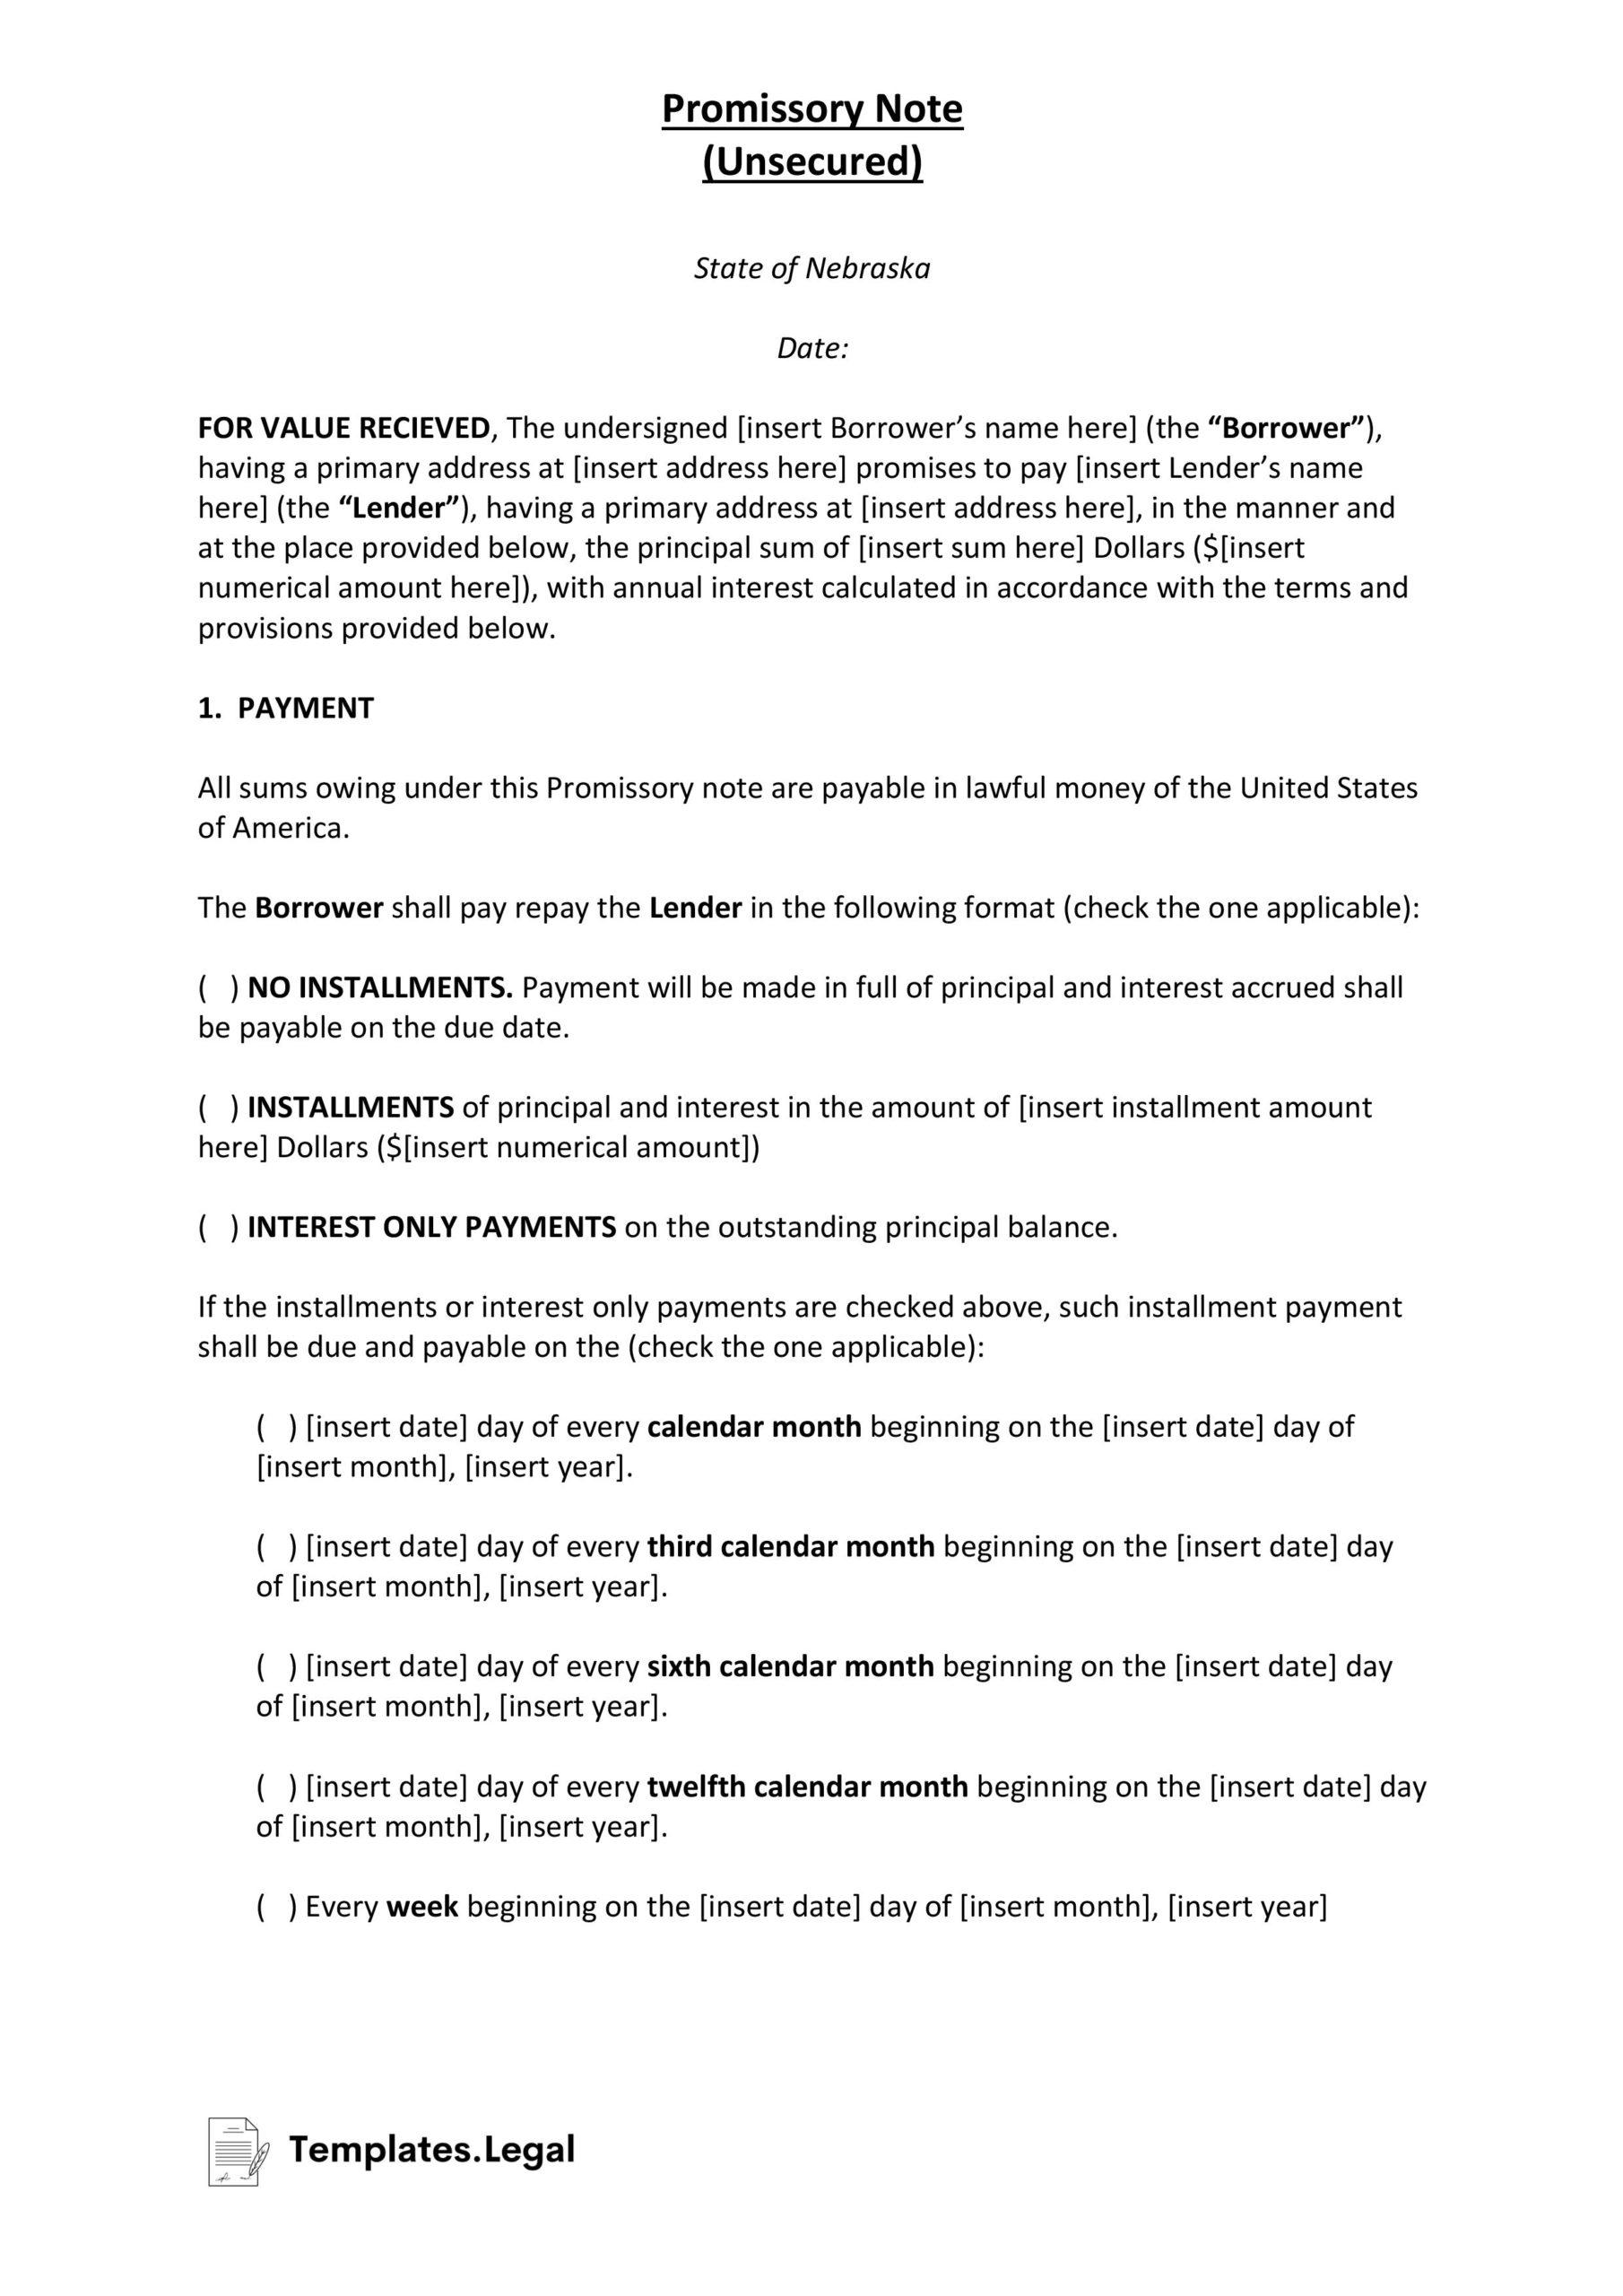 Nebraska Unsecured Promissory Note - Templates.Legal